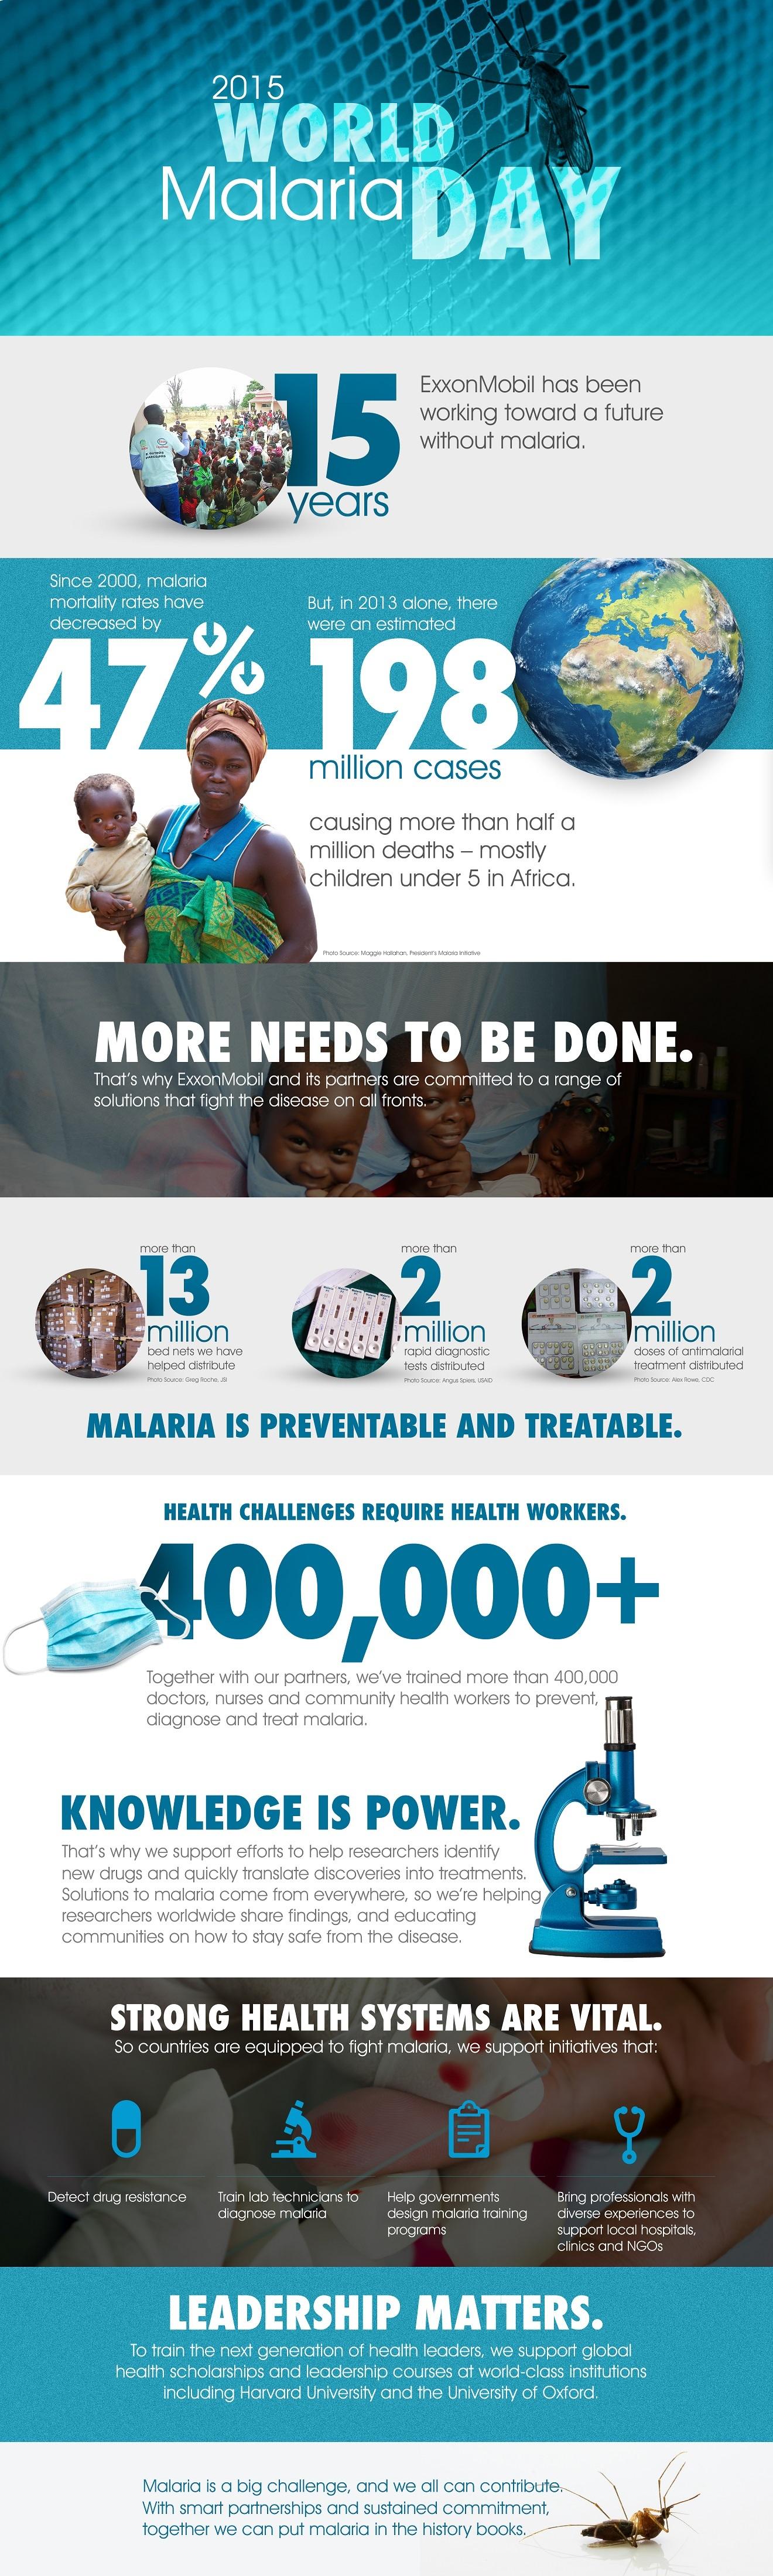 Hari Malaria Sedunia 2015